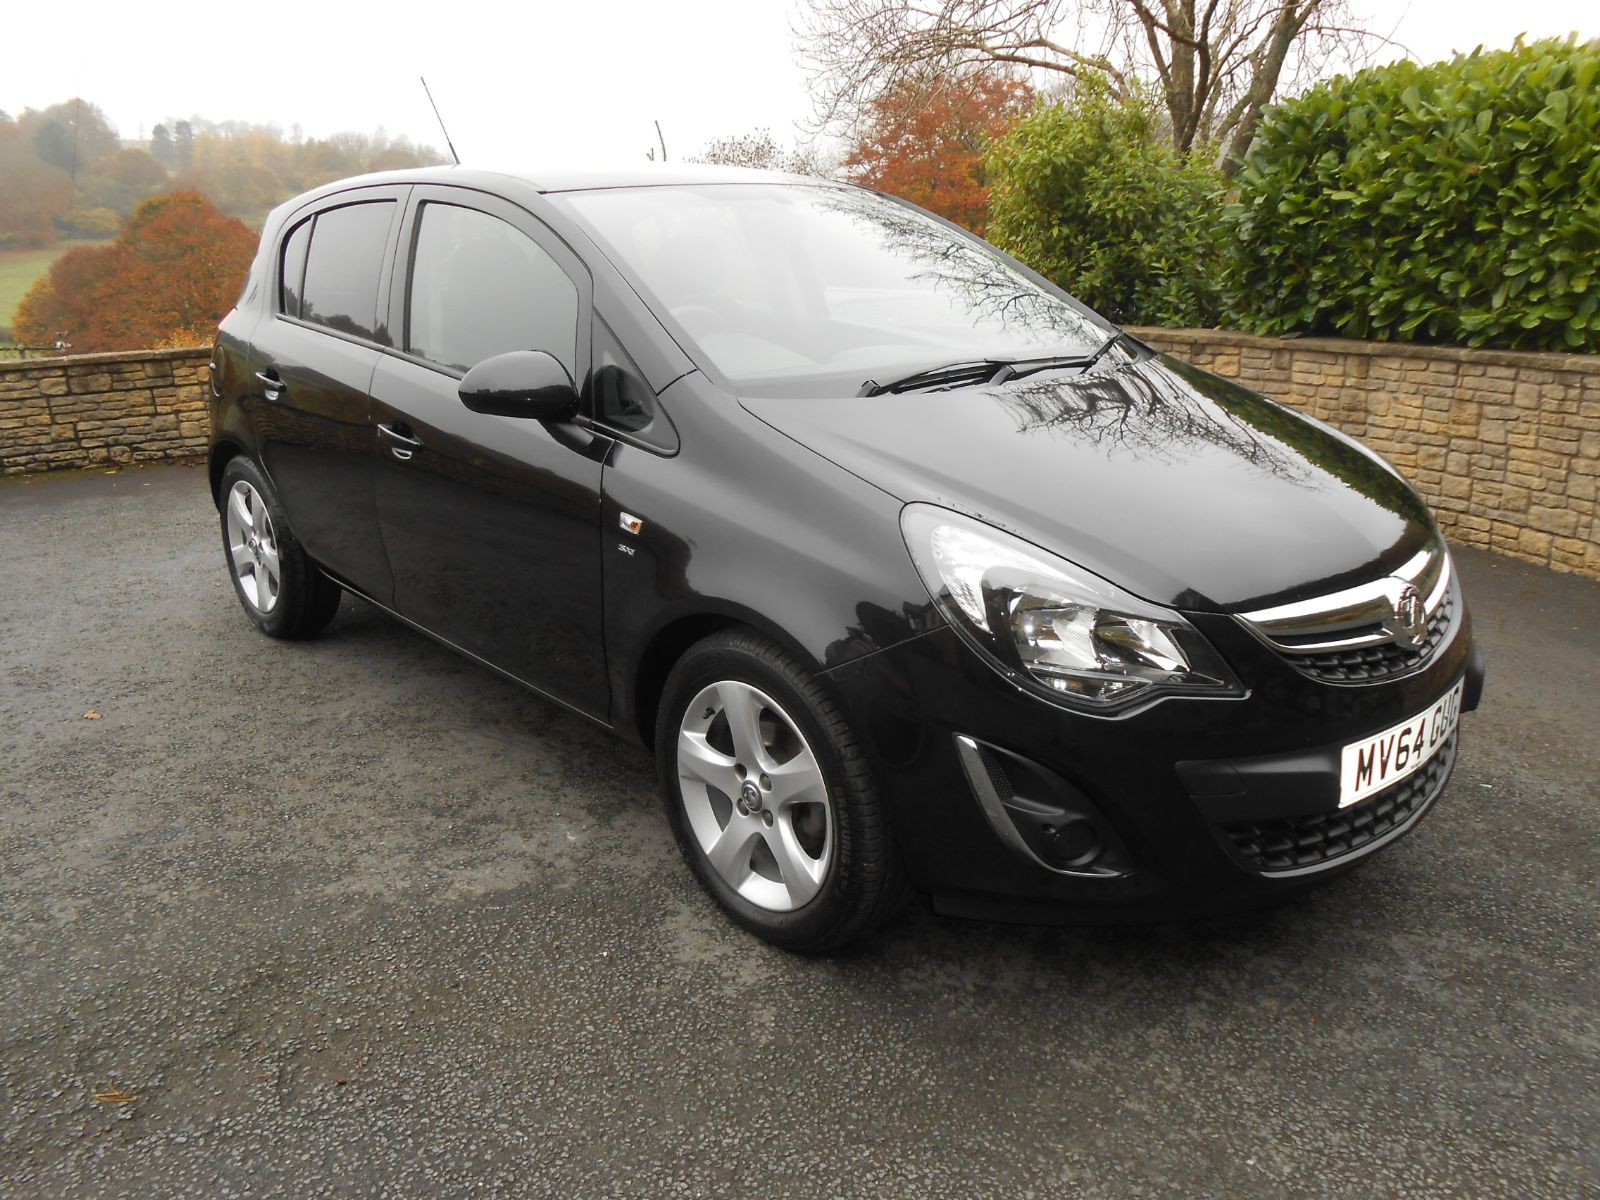 Vauxhall Corsa 1 4 Sxi 5 Door Car For Sale Llanidloes